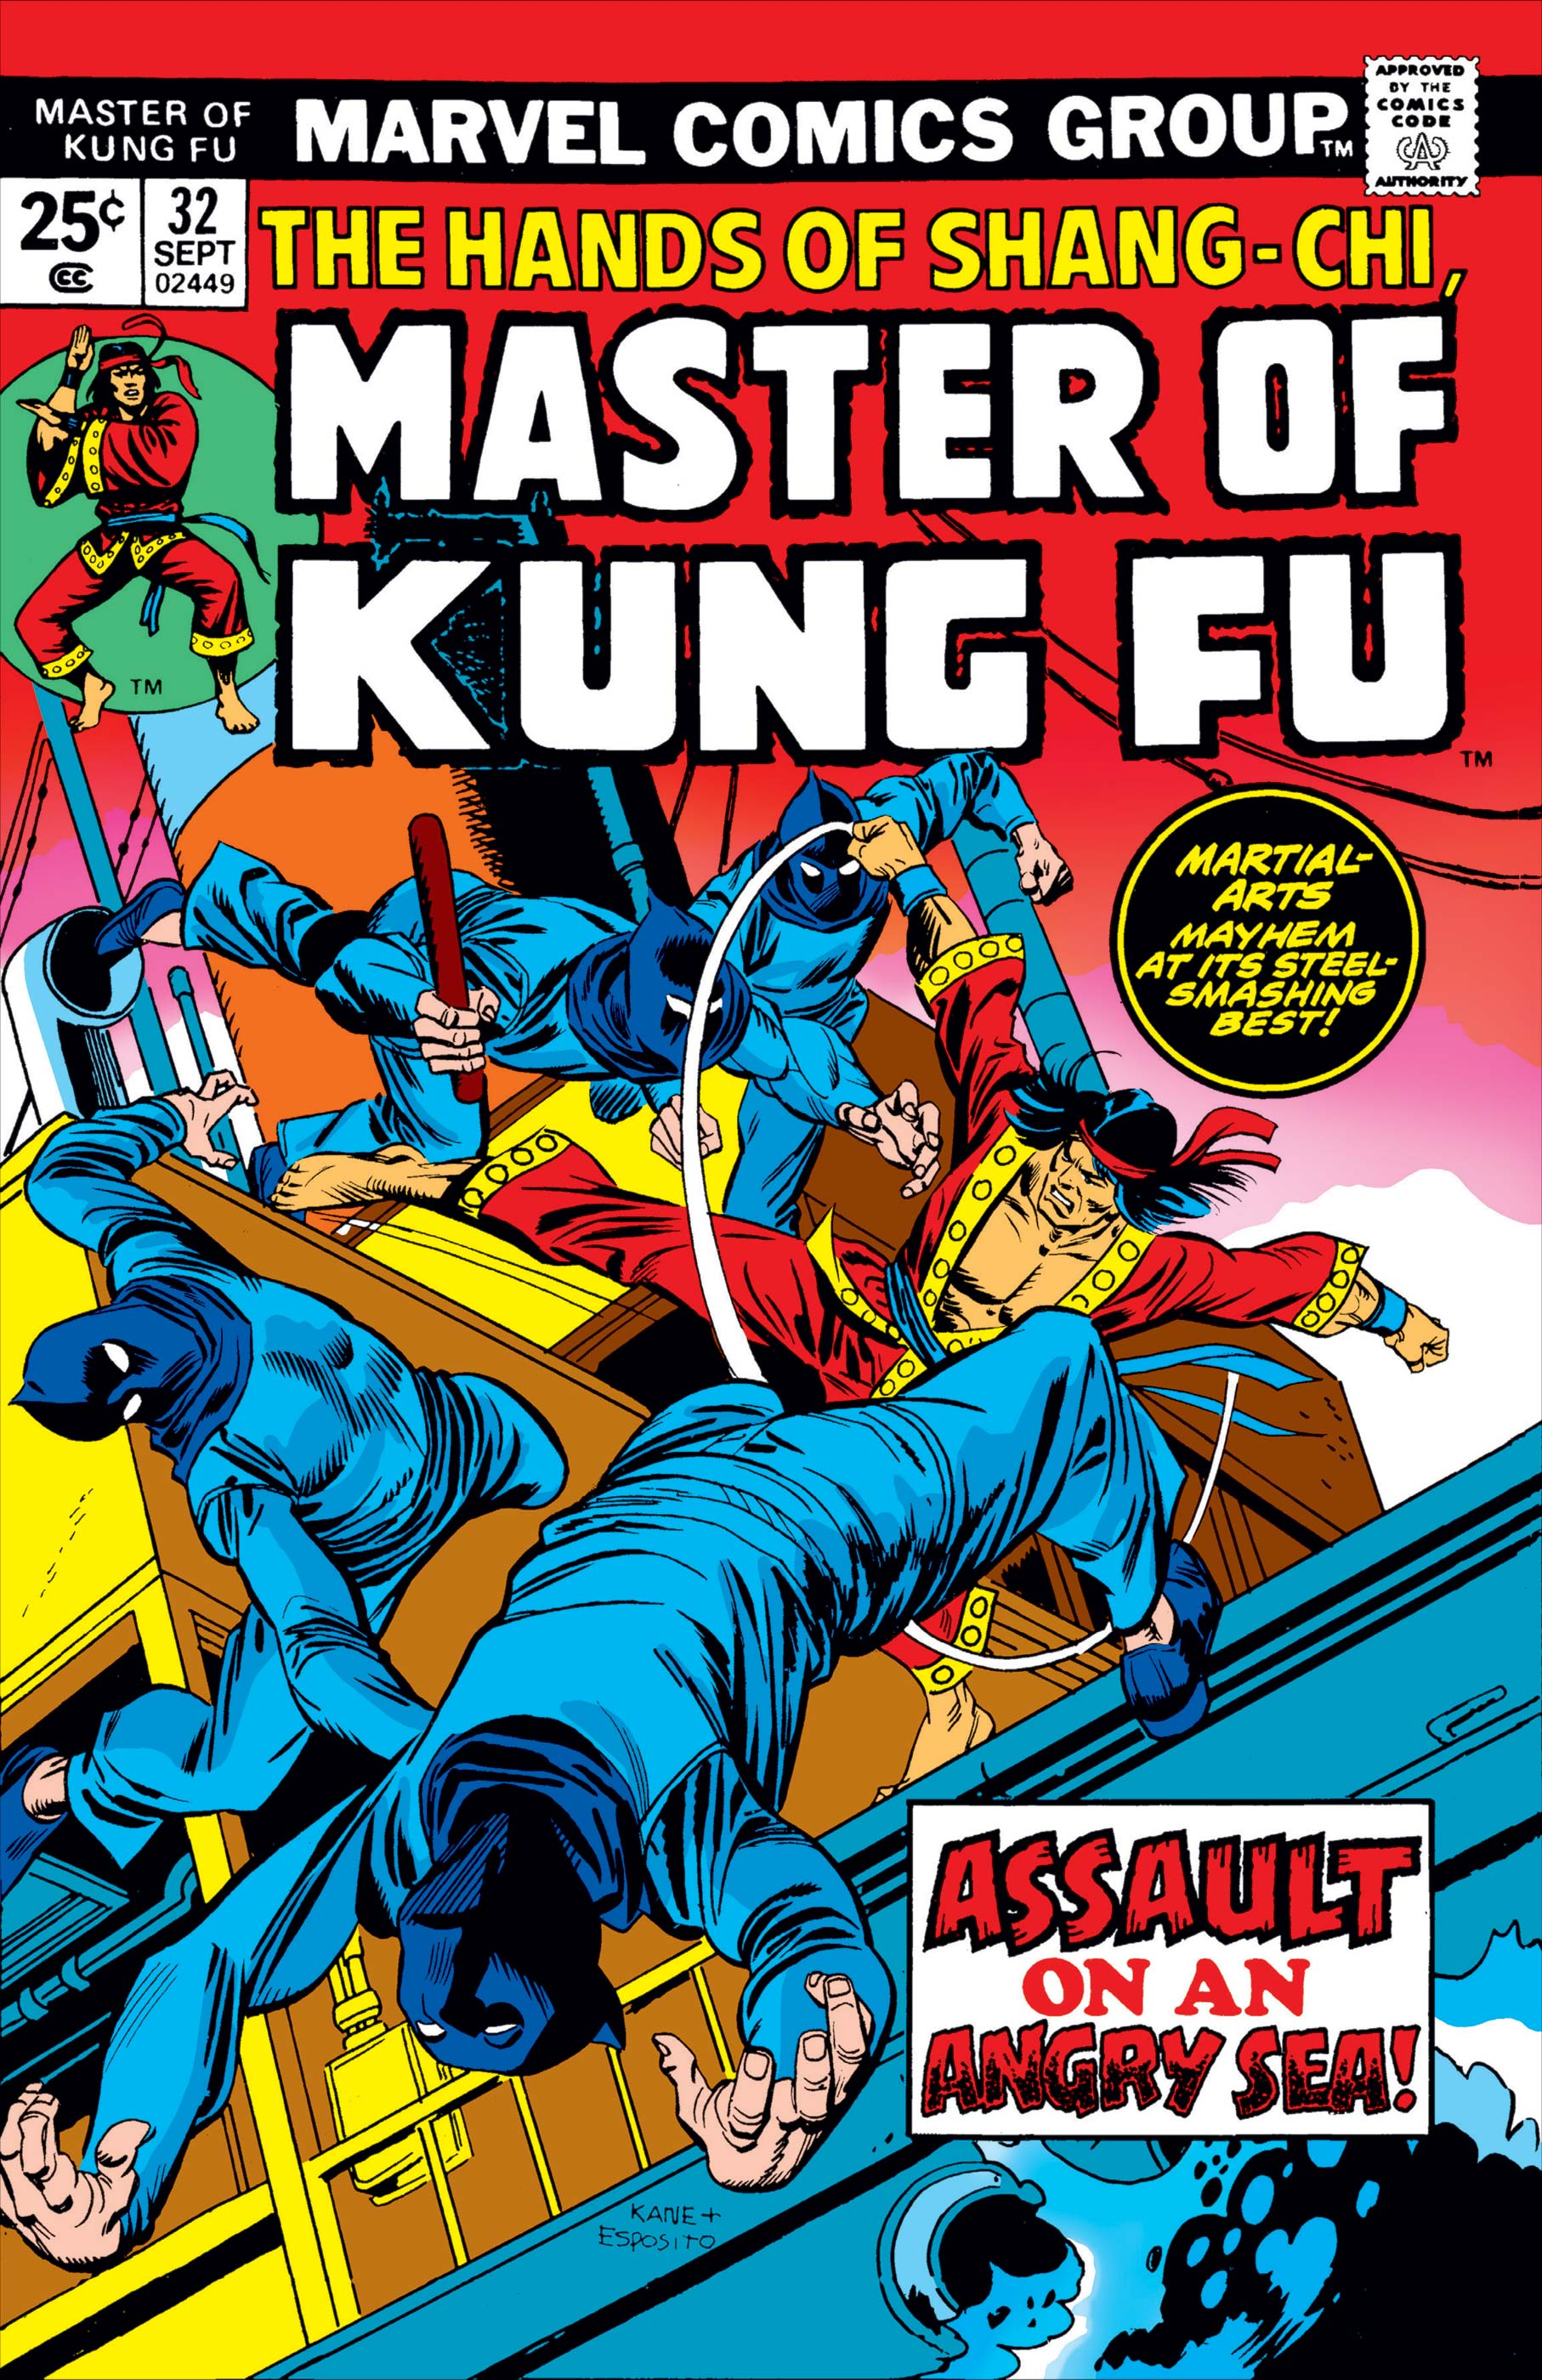 Master of Kung Fu (1974) #32